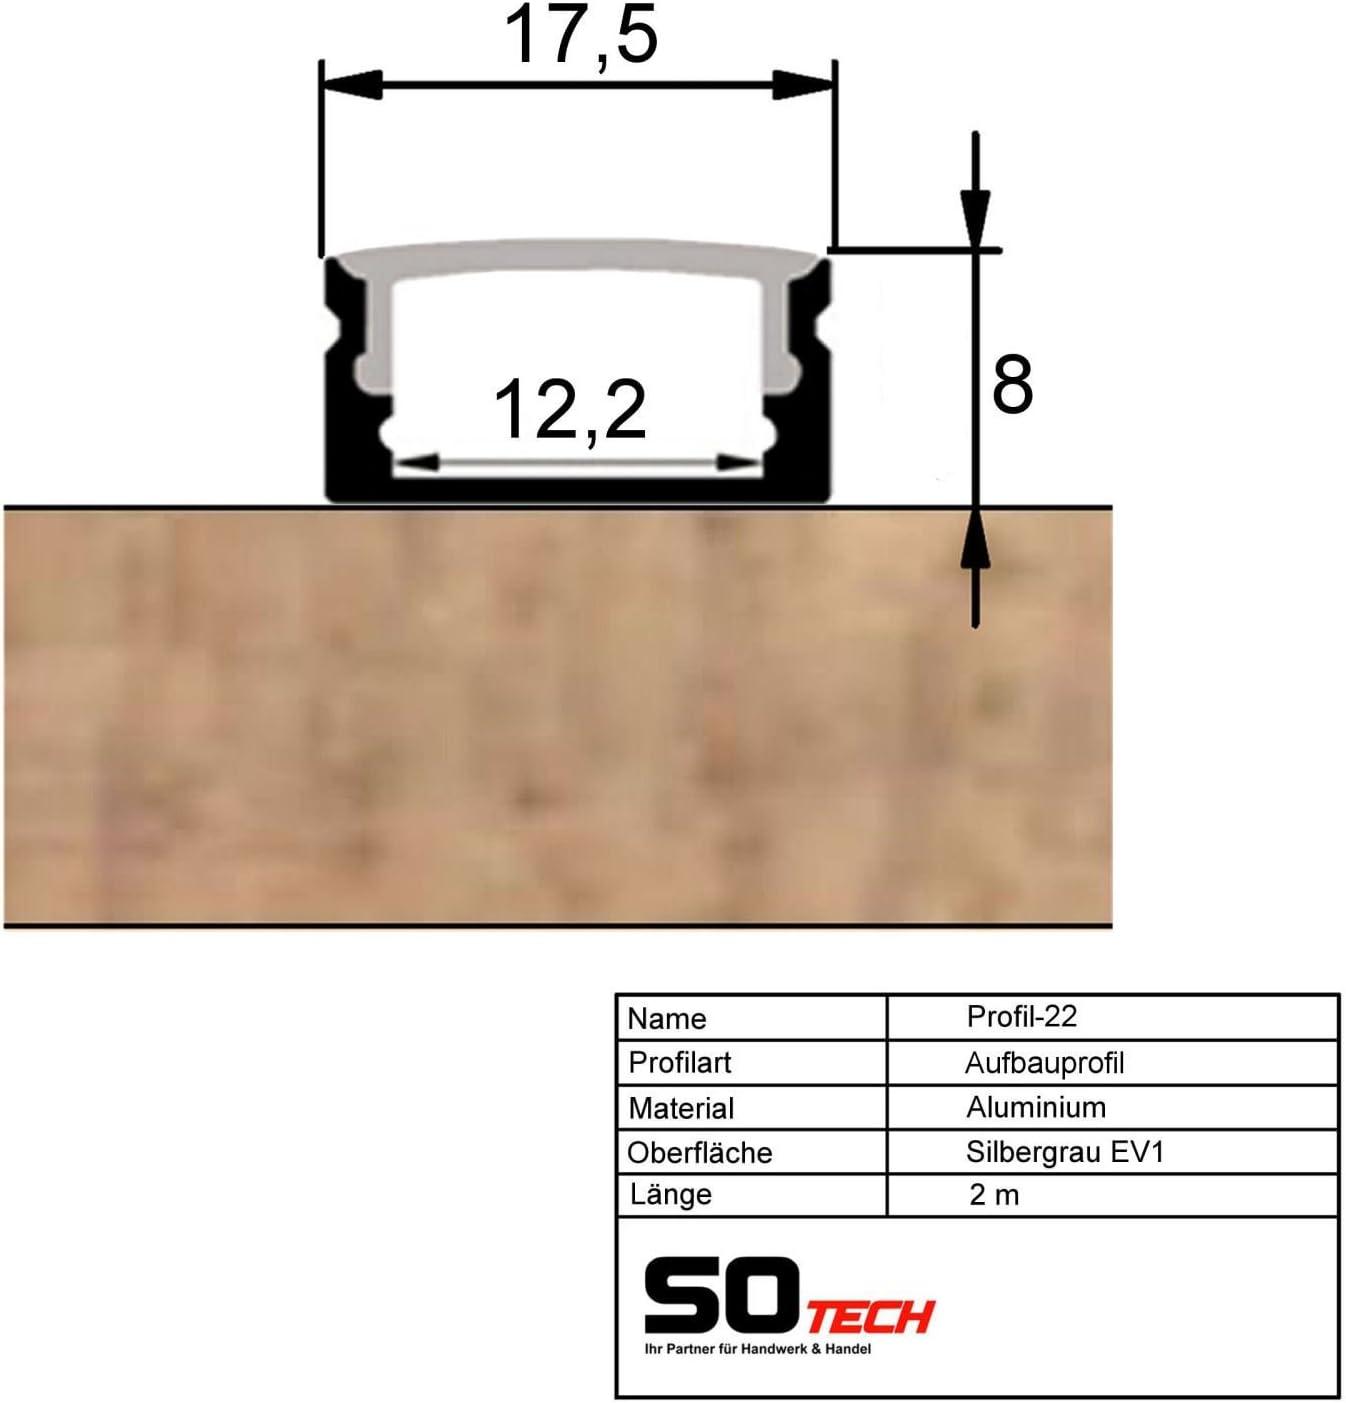 10 Stück SO-TECH® LED Profil-22 mit opalfarbiger Abdeckung je 2m für LED Streifen 10 X Profil-22 Klar